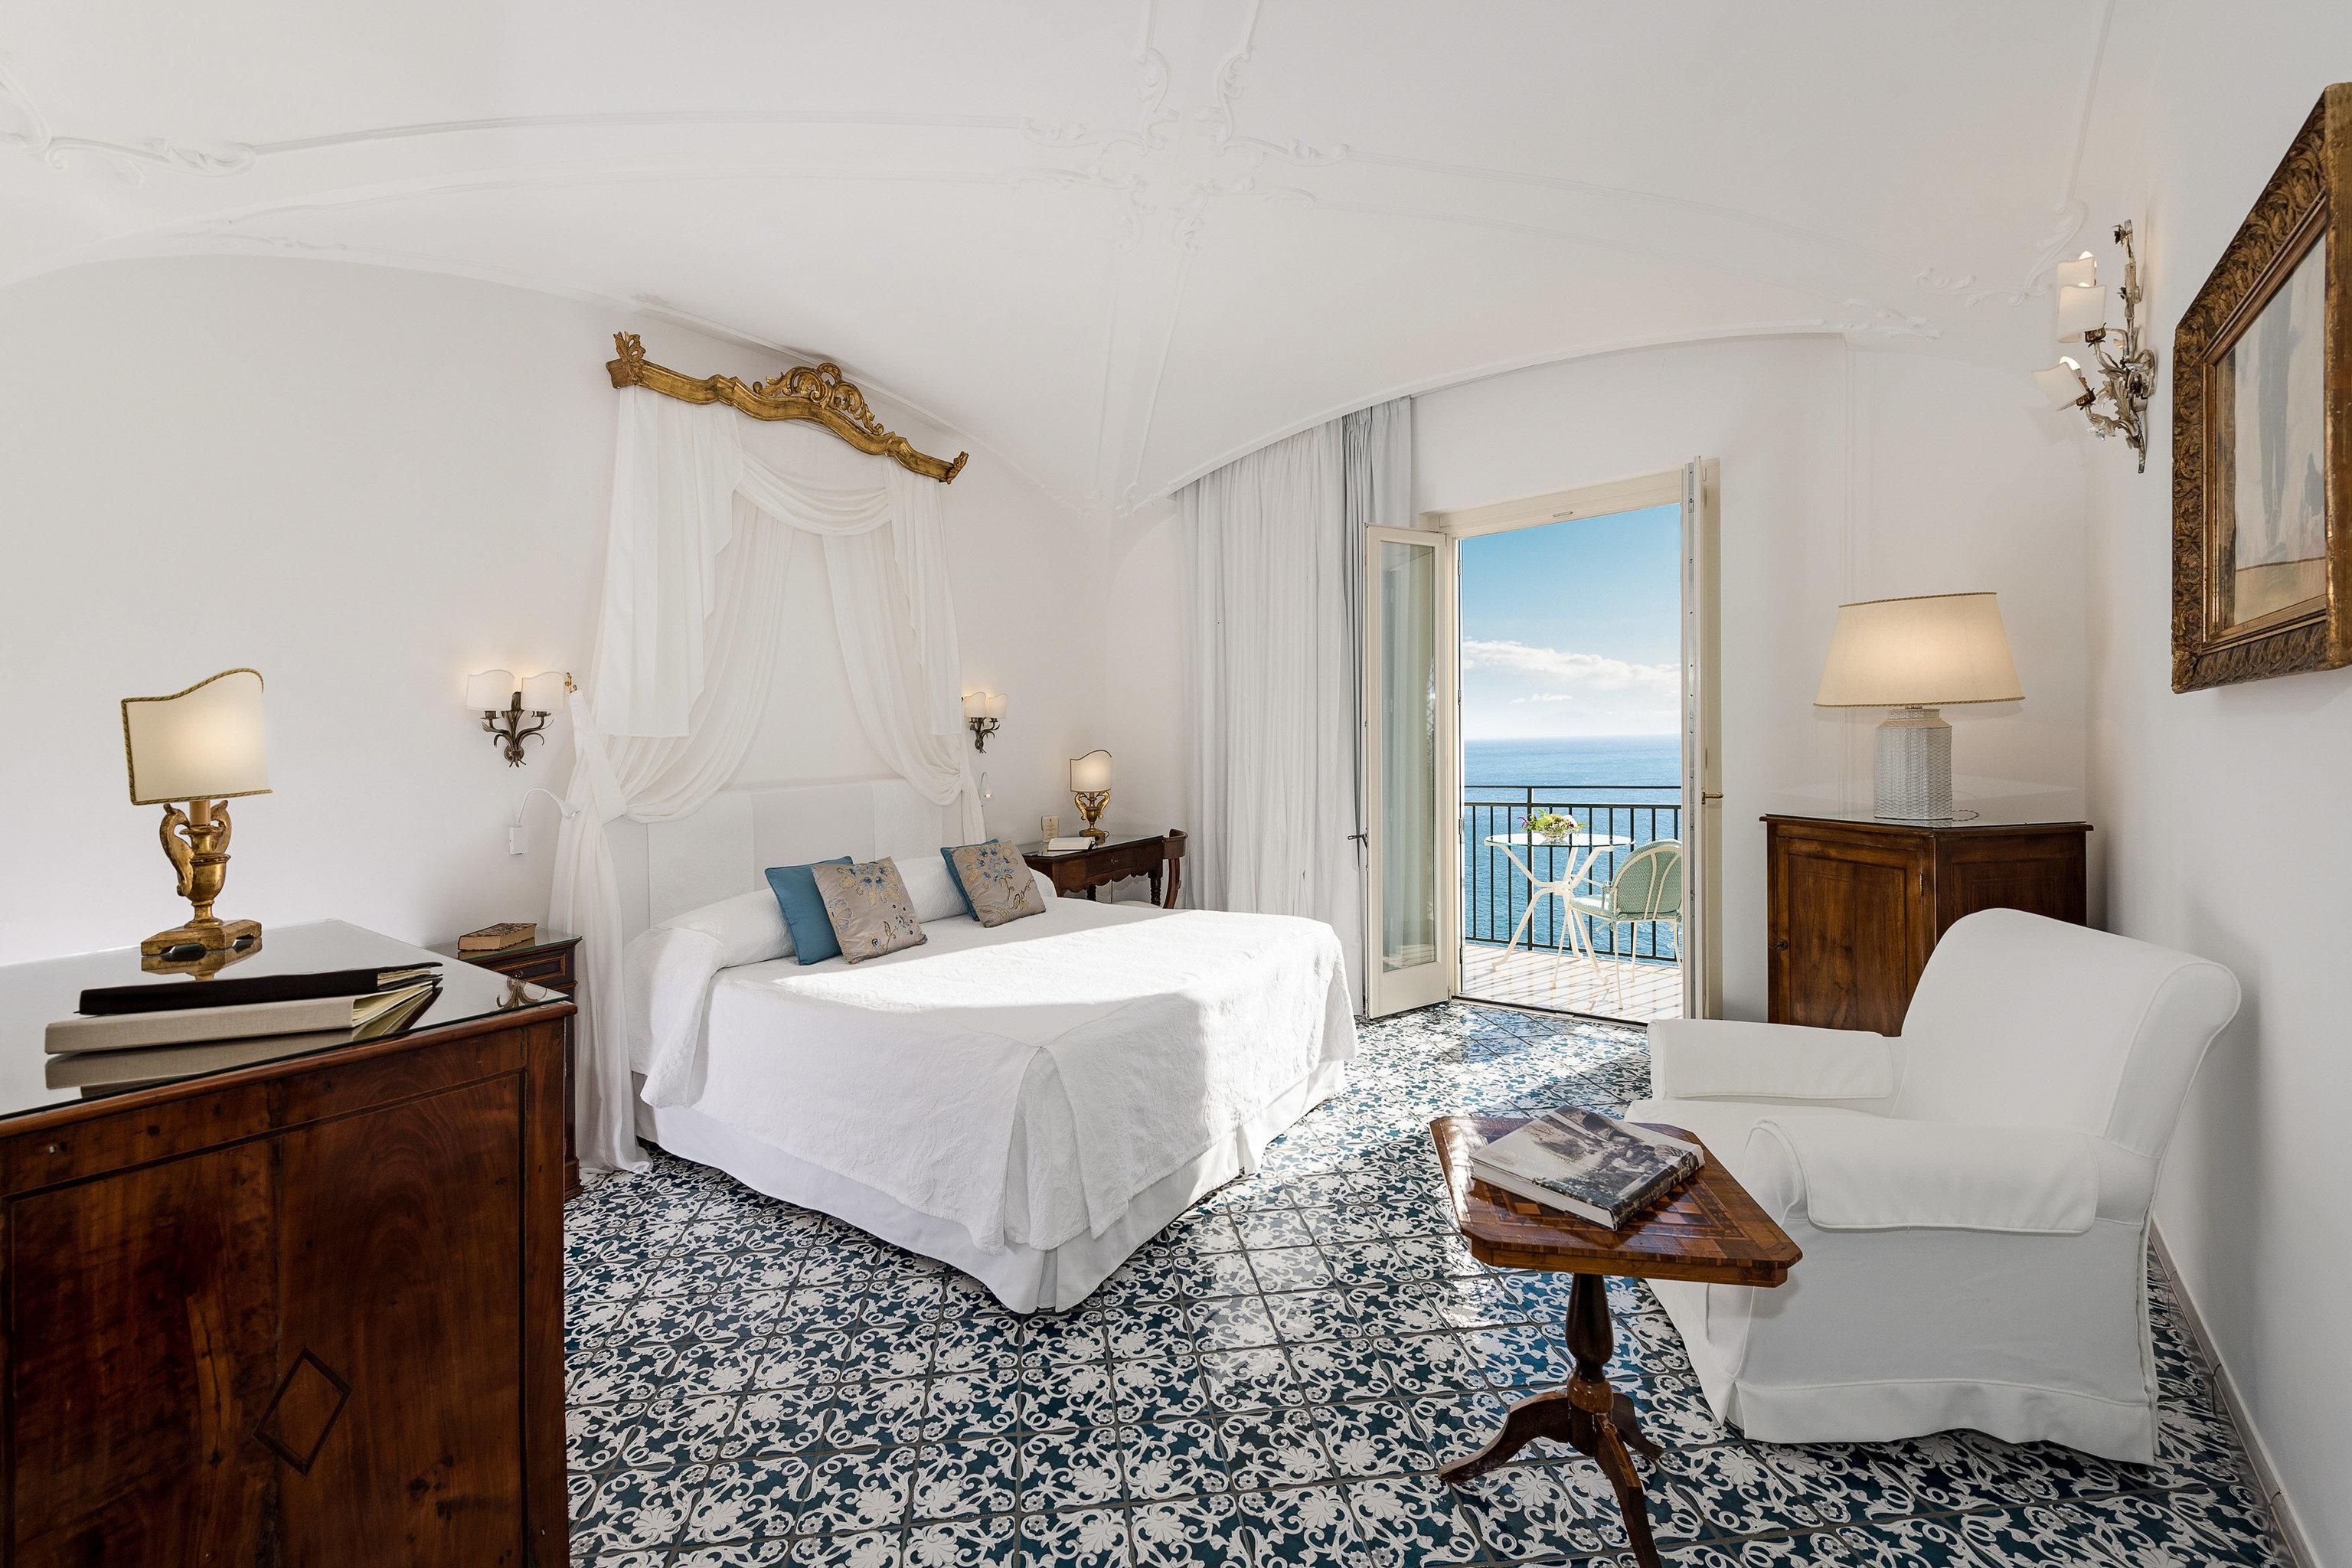 Hotels Romance Travel Tech Travel Tips Suite Bedroom comfort